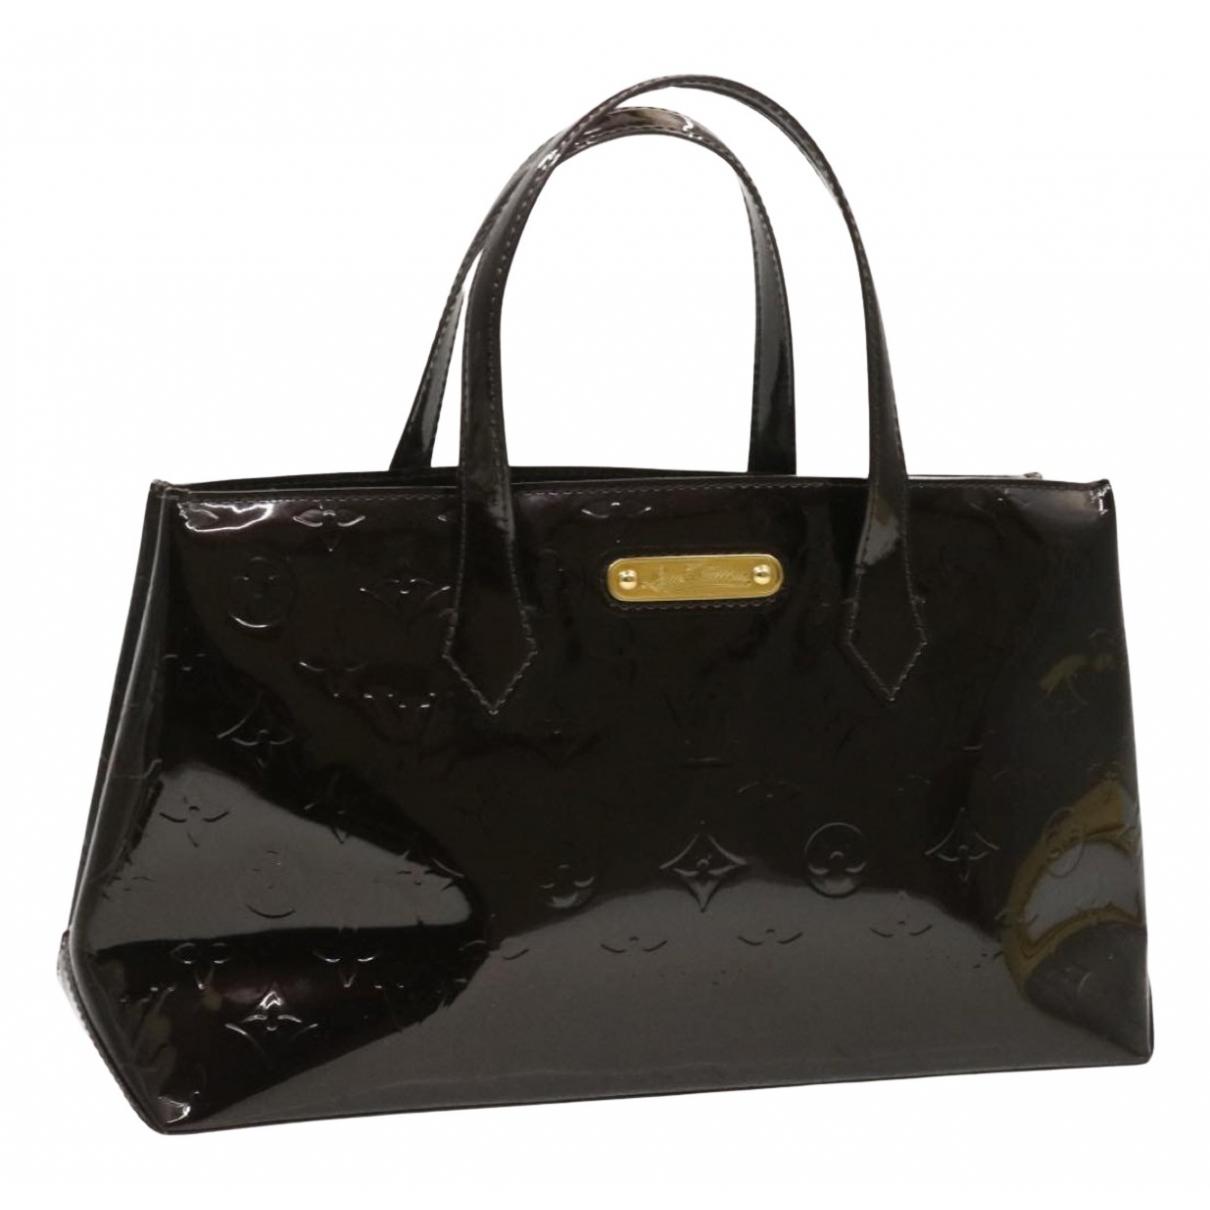 Bolso  Wilshire de Charol Louis Vuitton